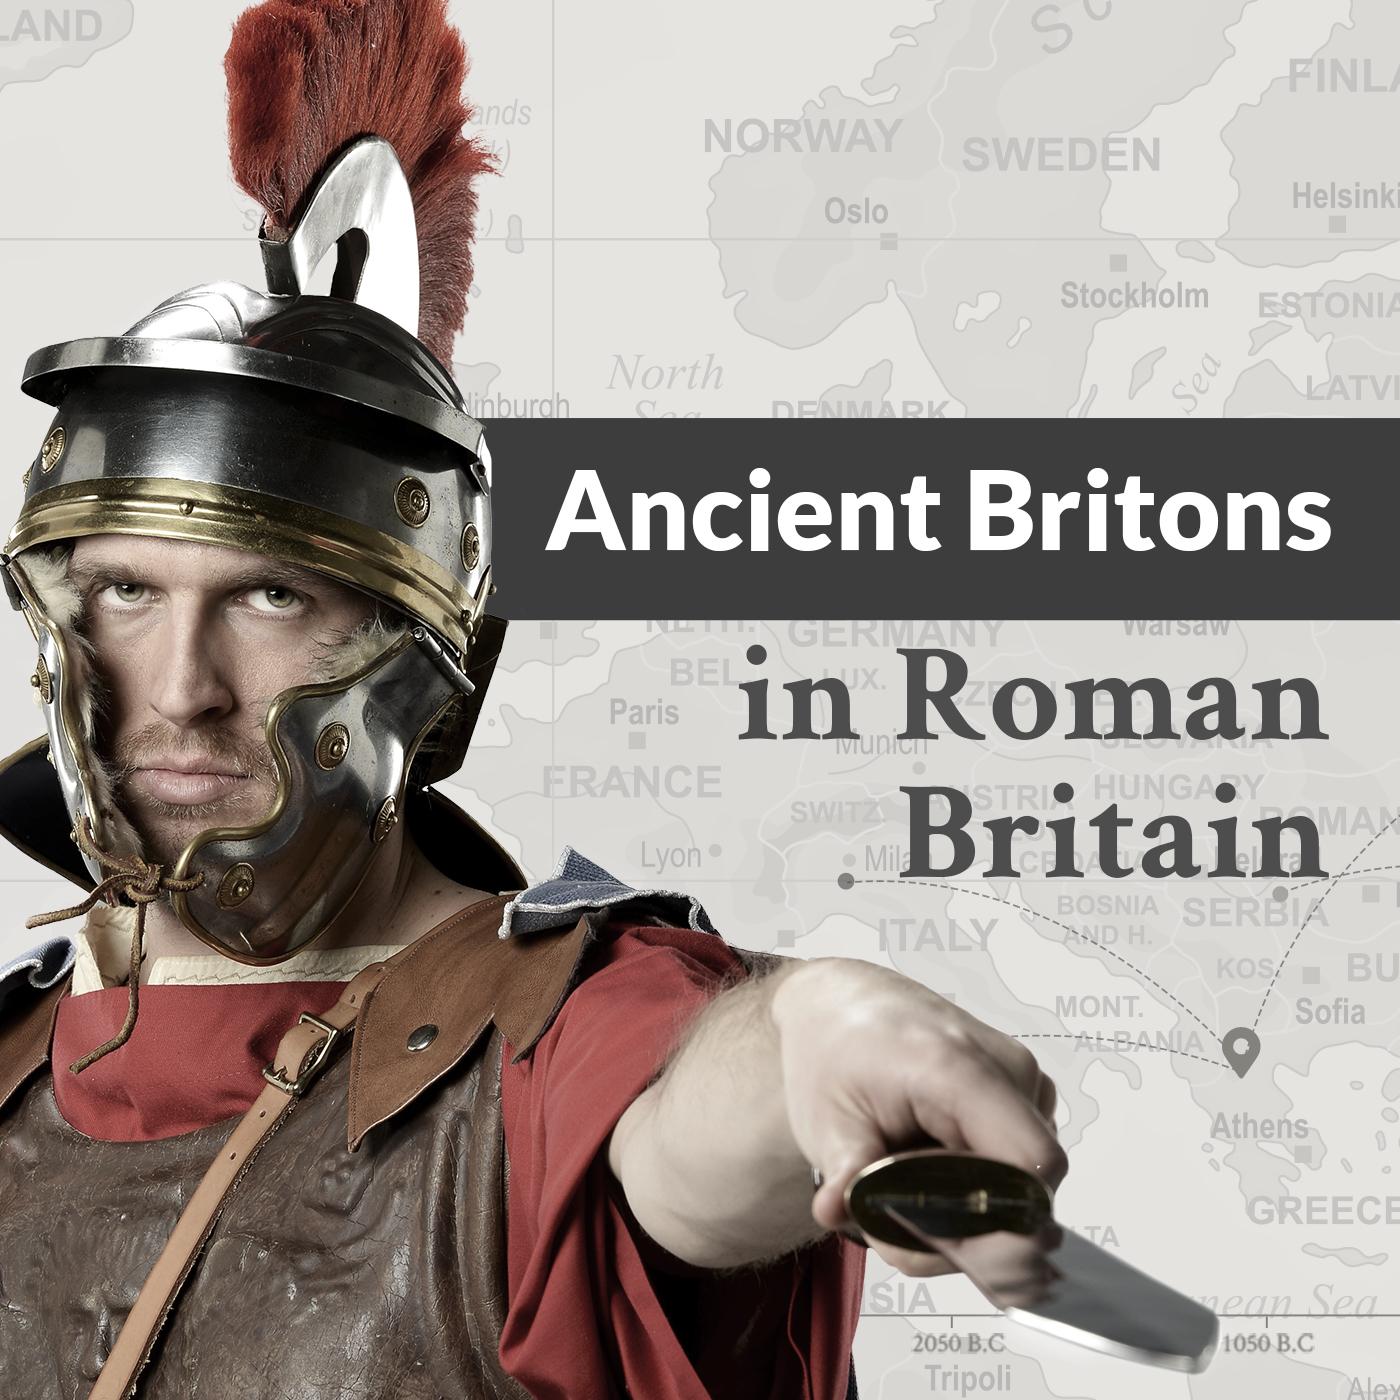 Ancient Britons of Roman England